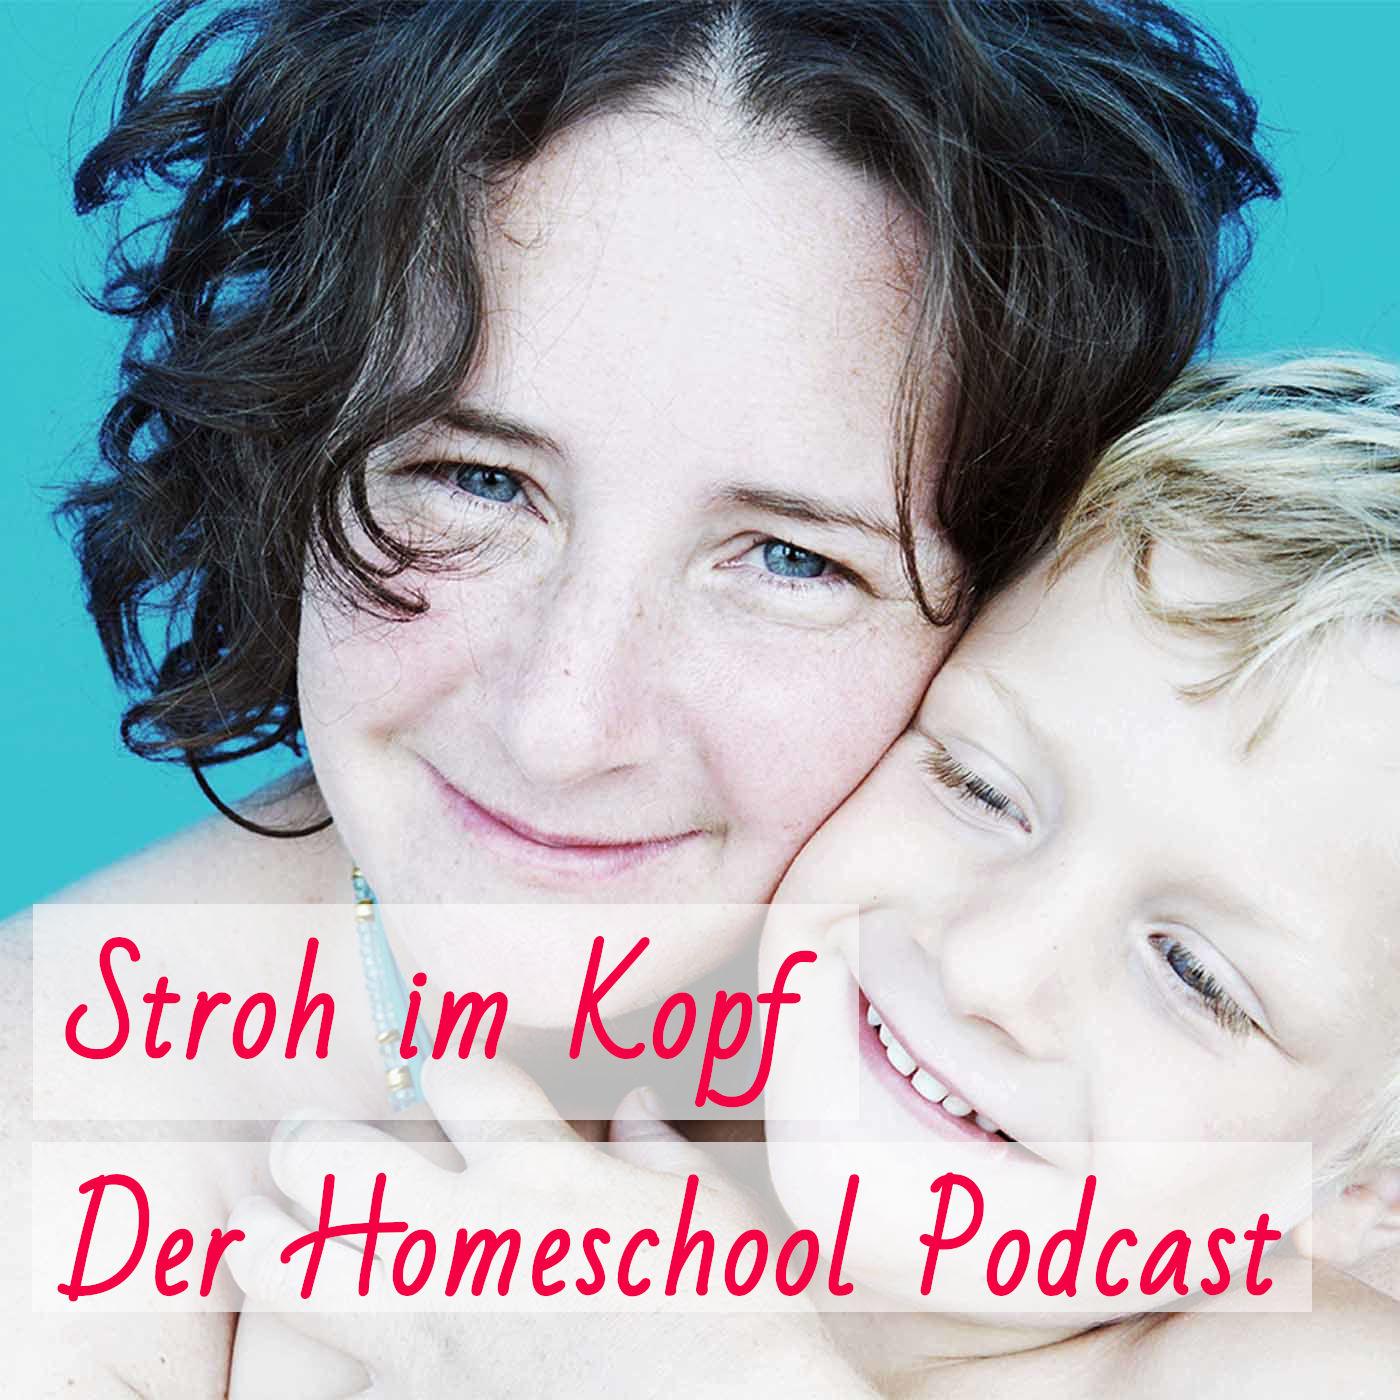 Stroh im Kopf – Der Homeschool - Podcast show art